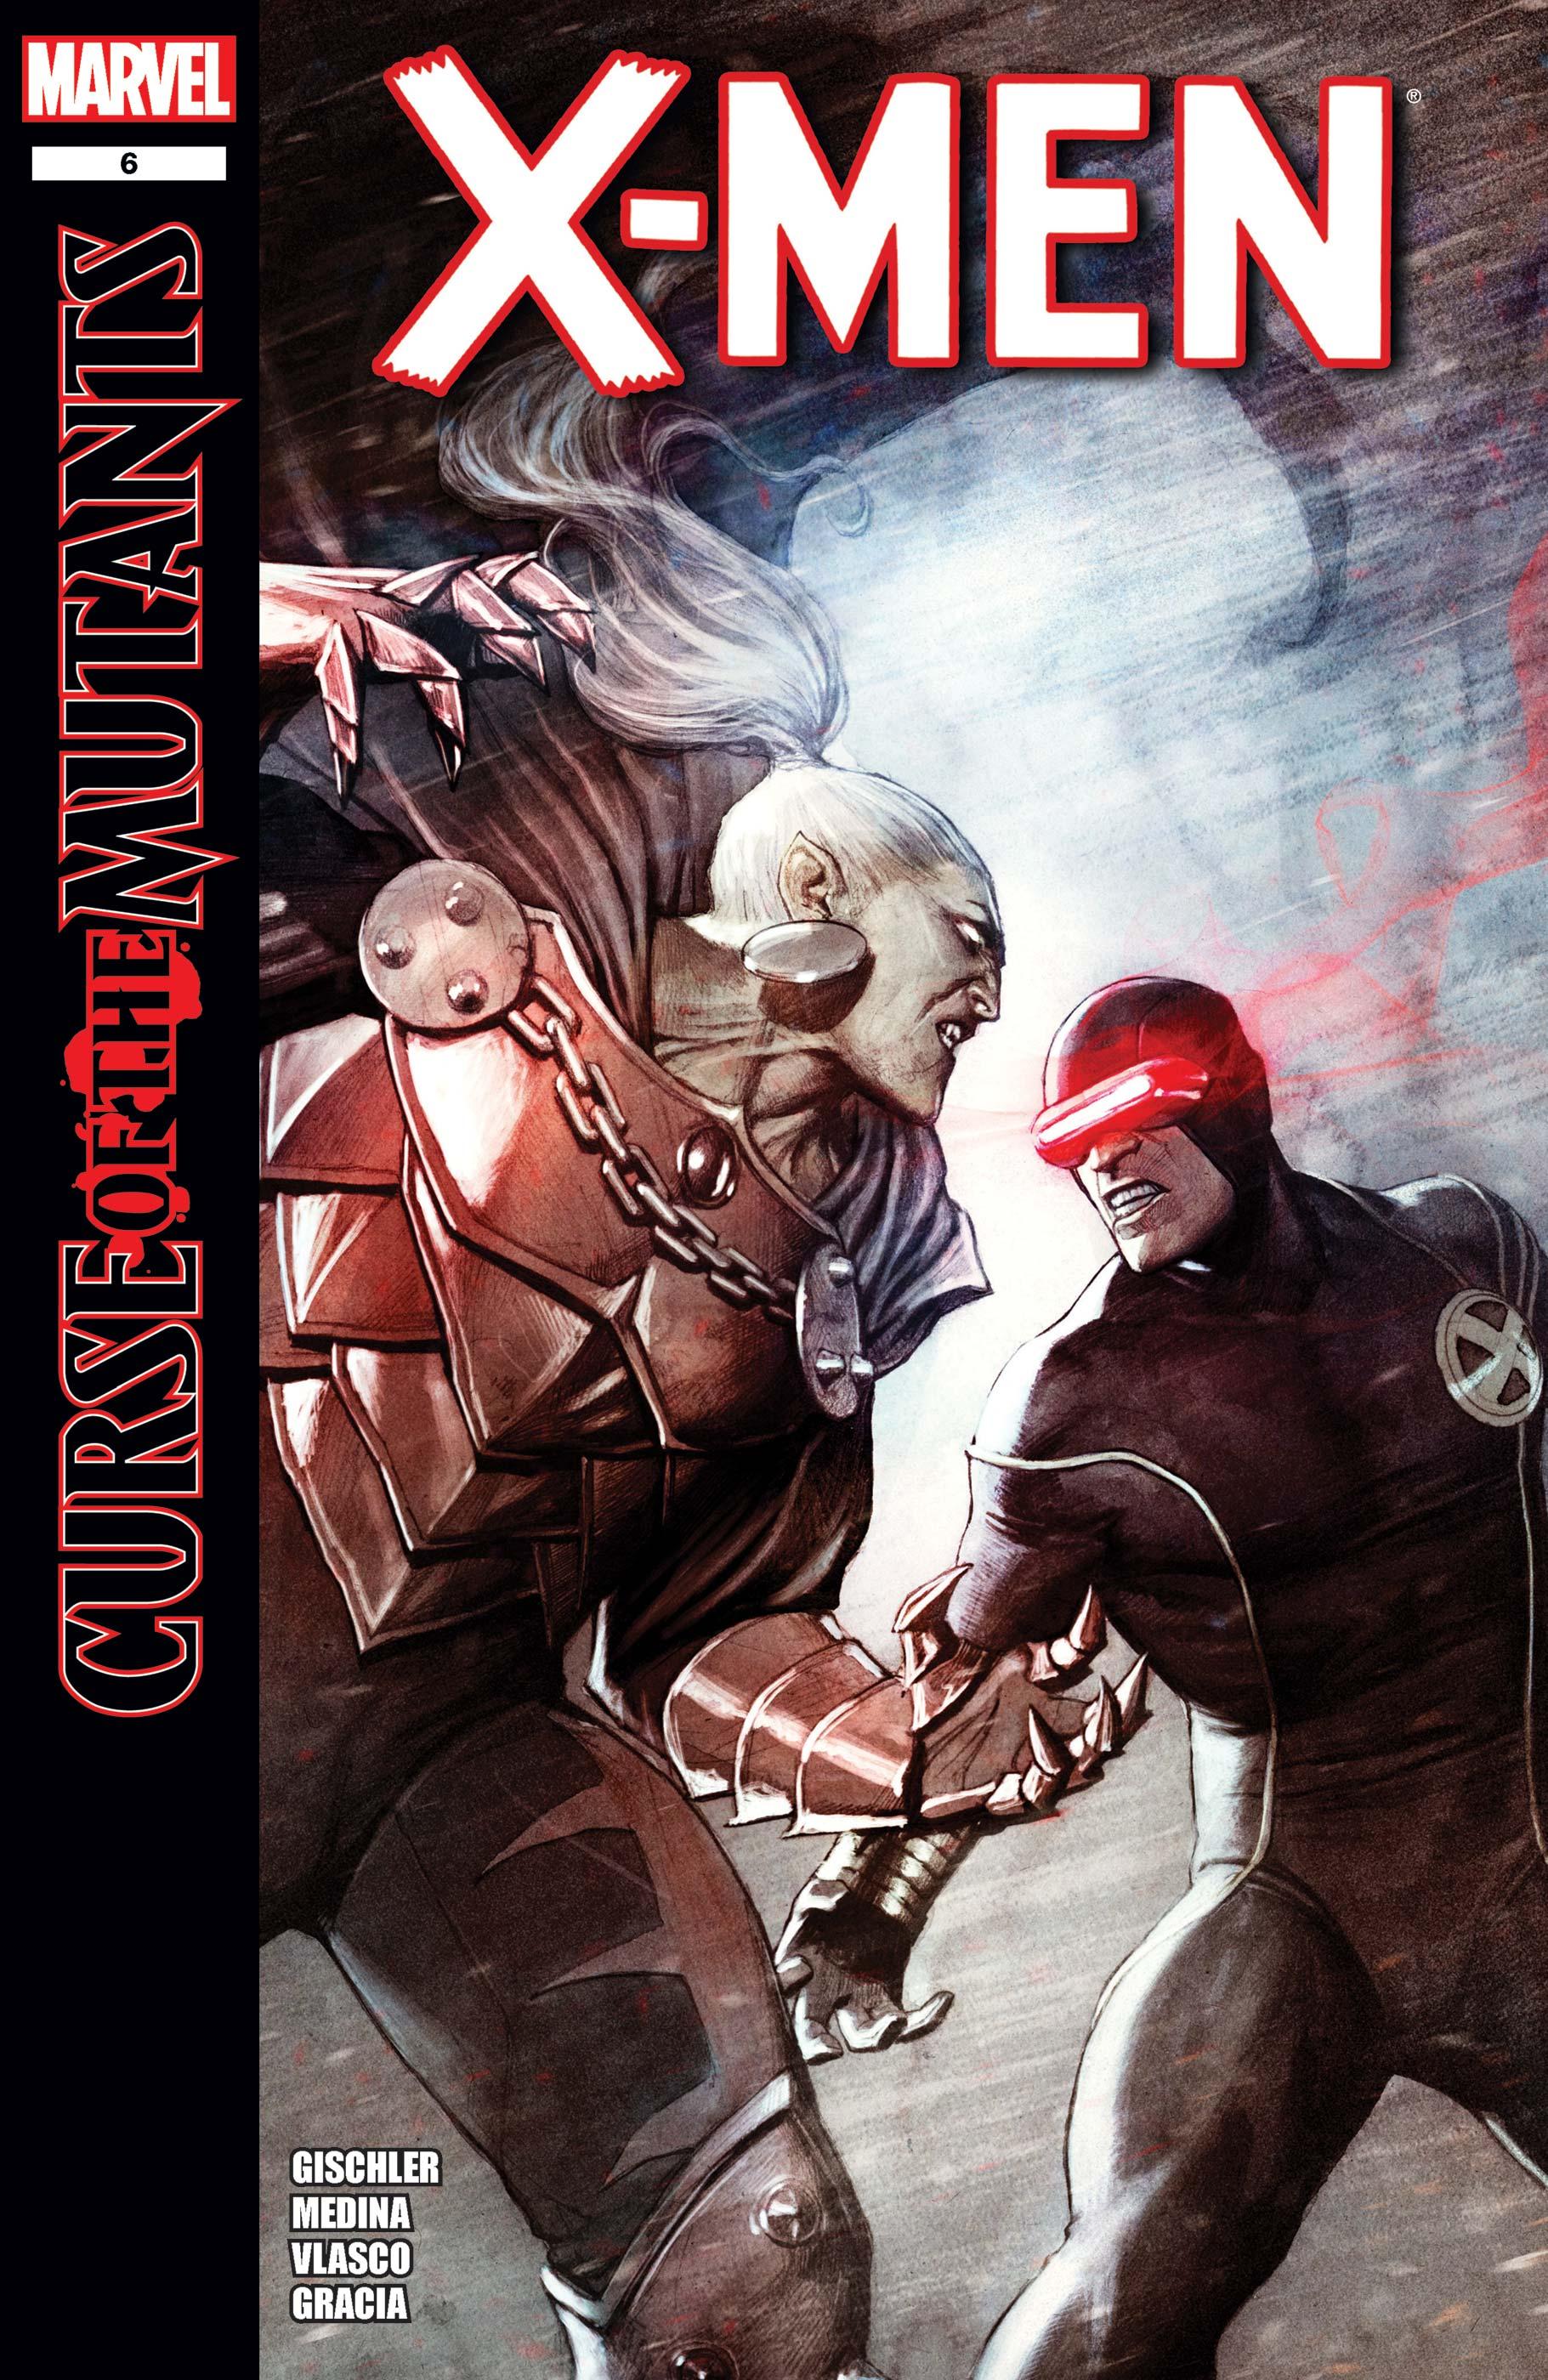 X-Men (2010) #6